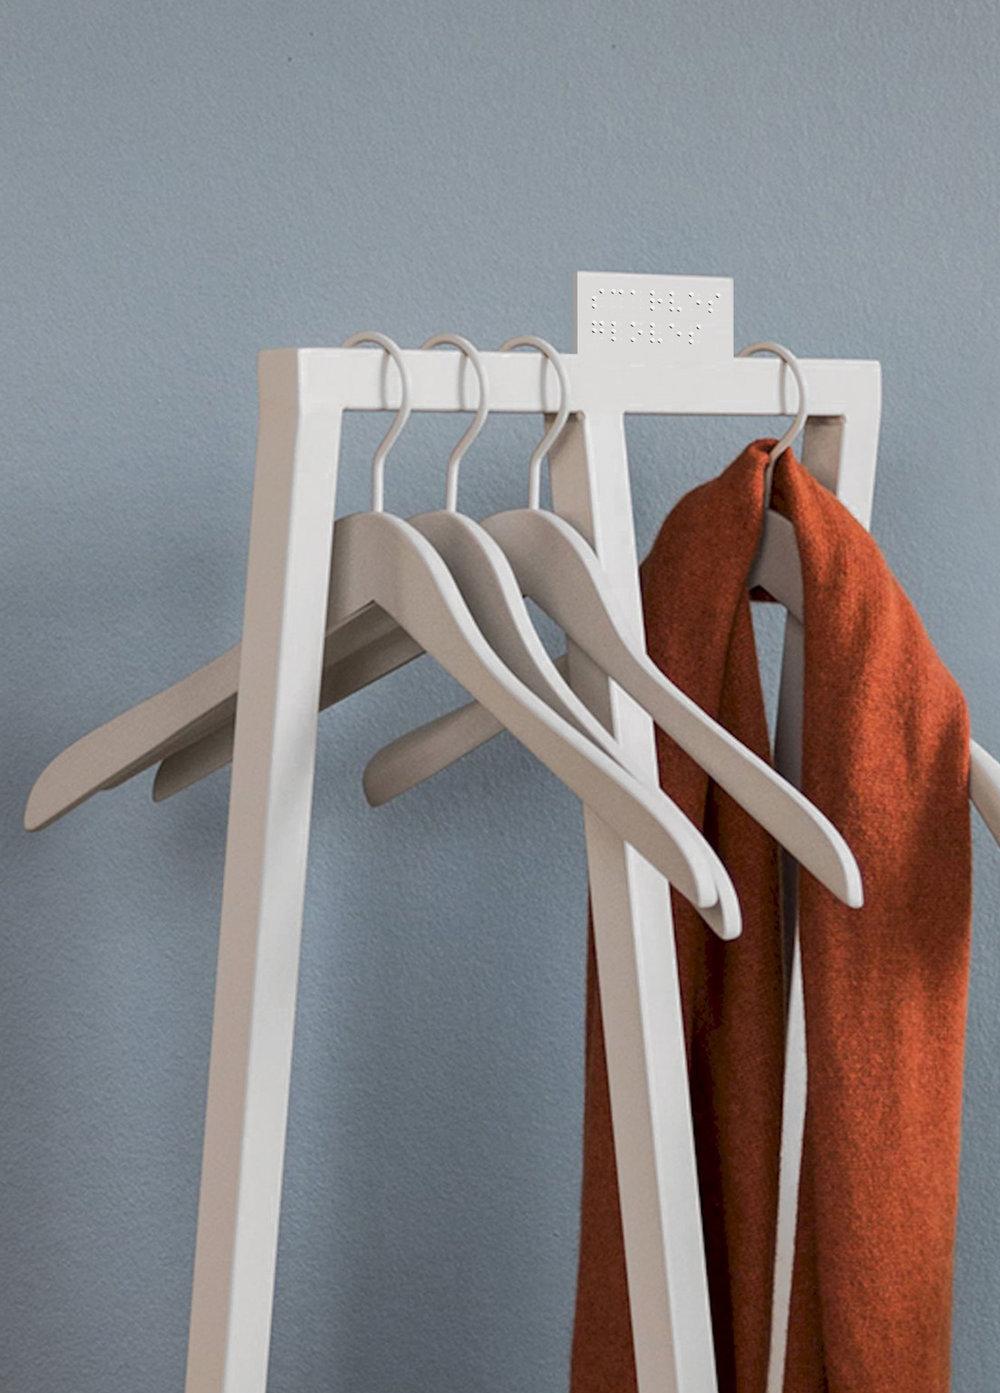 Hangers-1.jpg